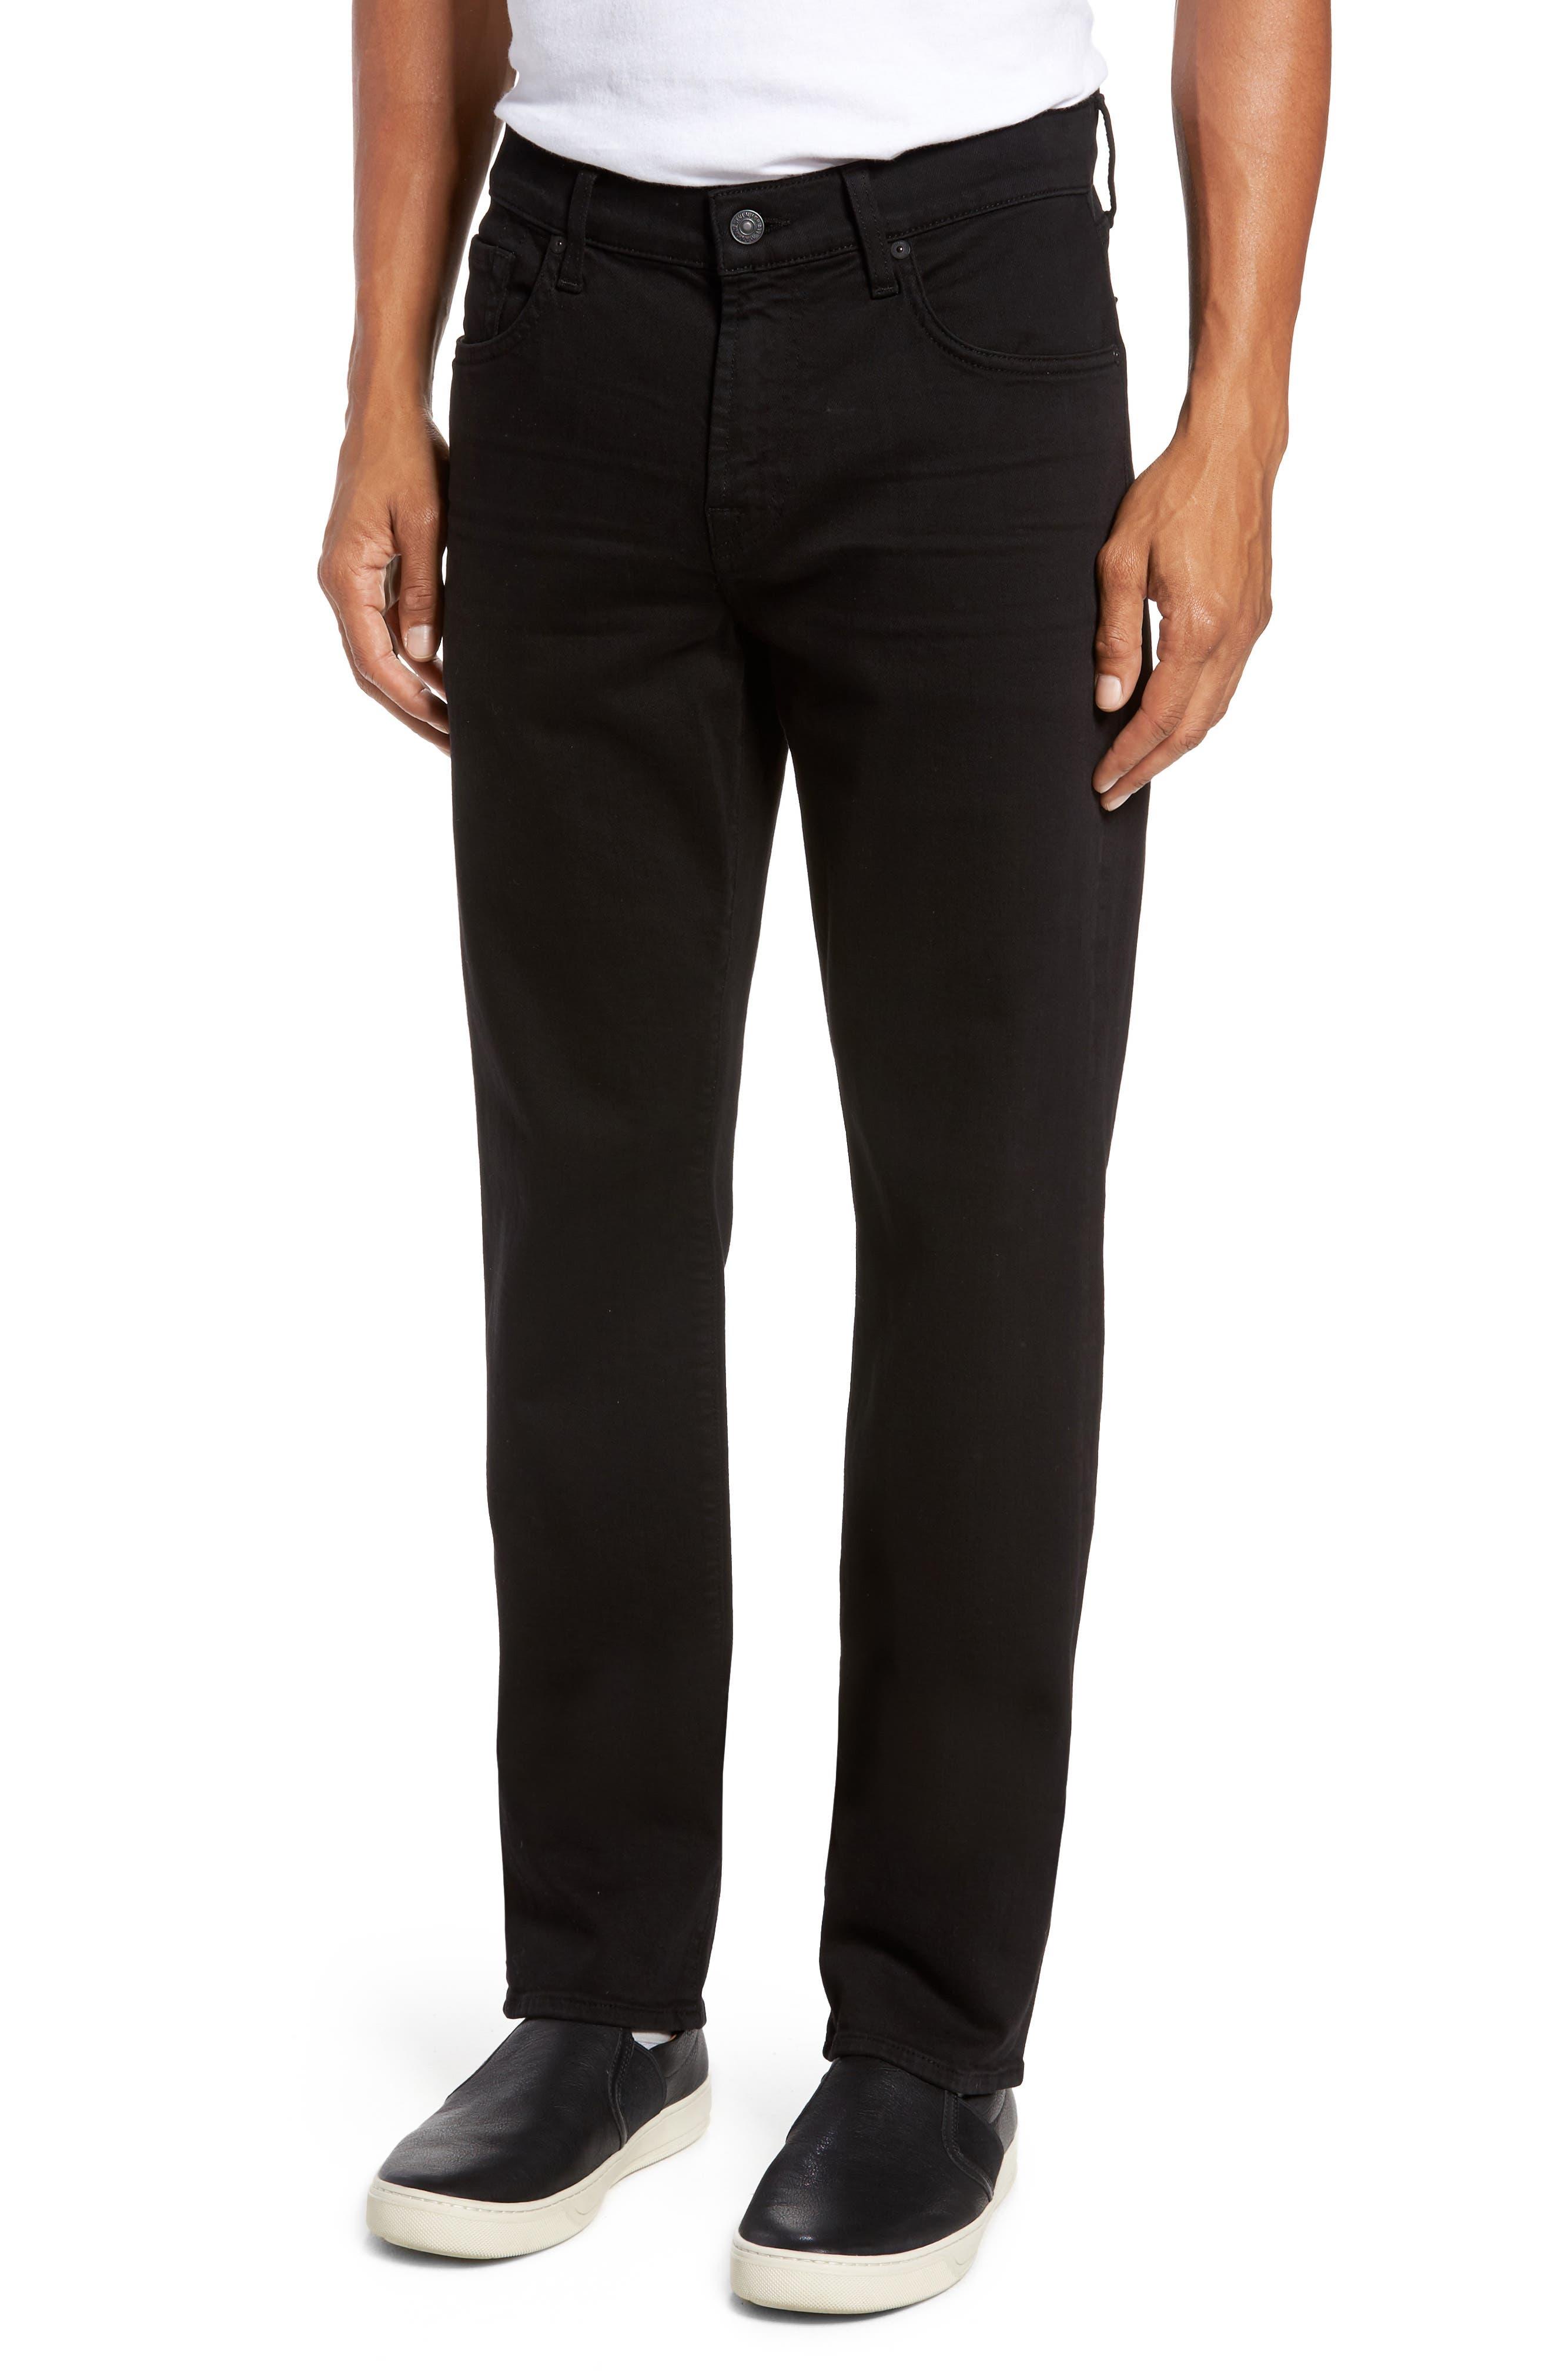 Luxe Performance - Slimmy Slim Fit Jeans,                         Main,                         color, Annex Black